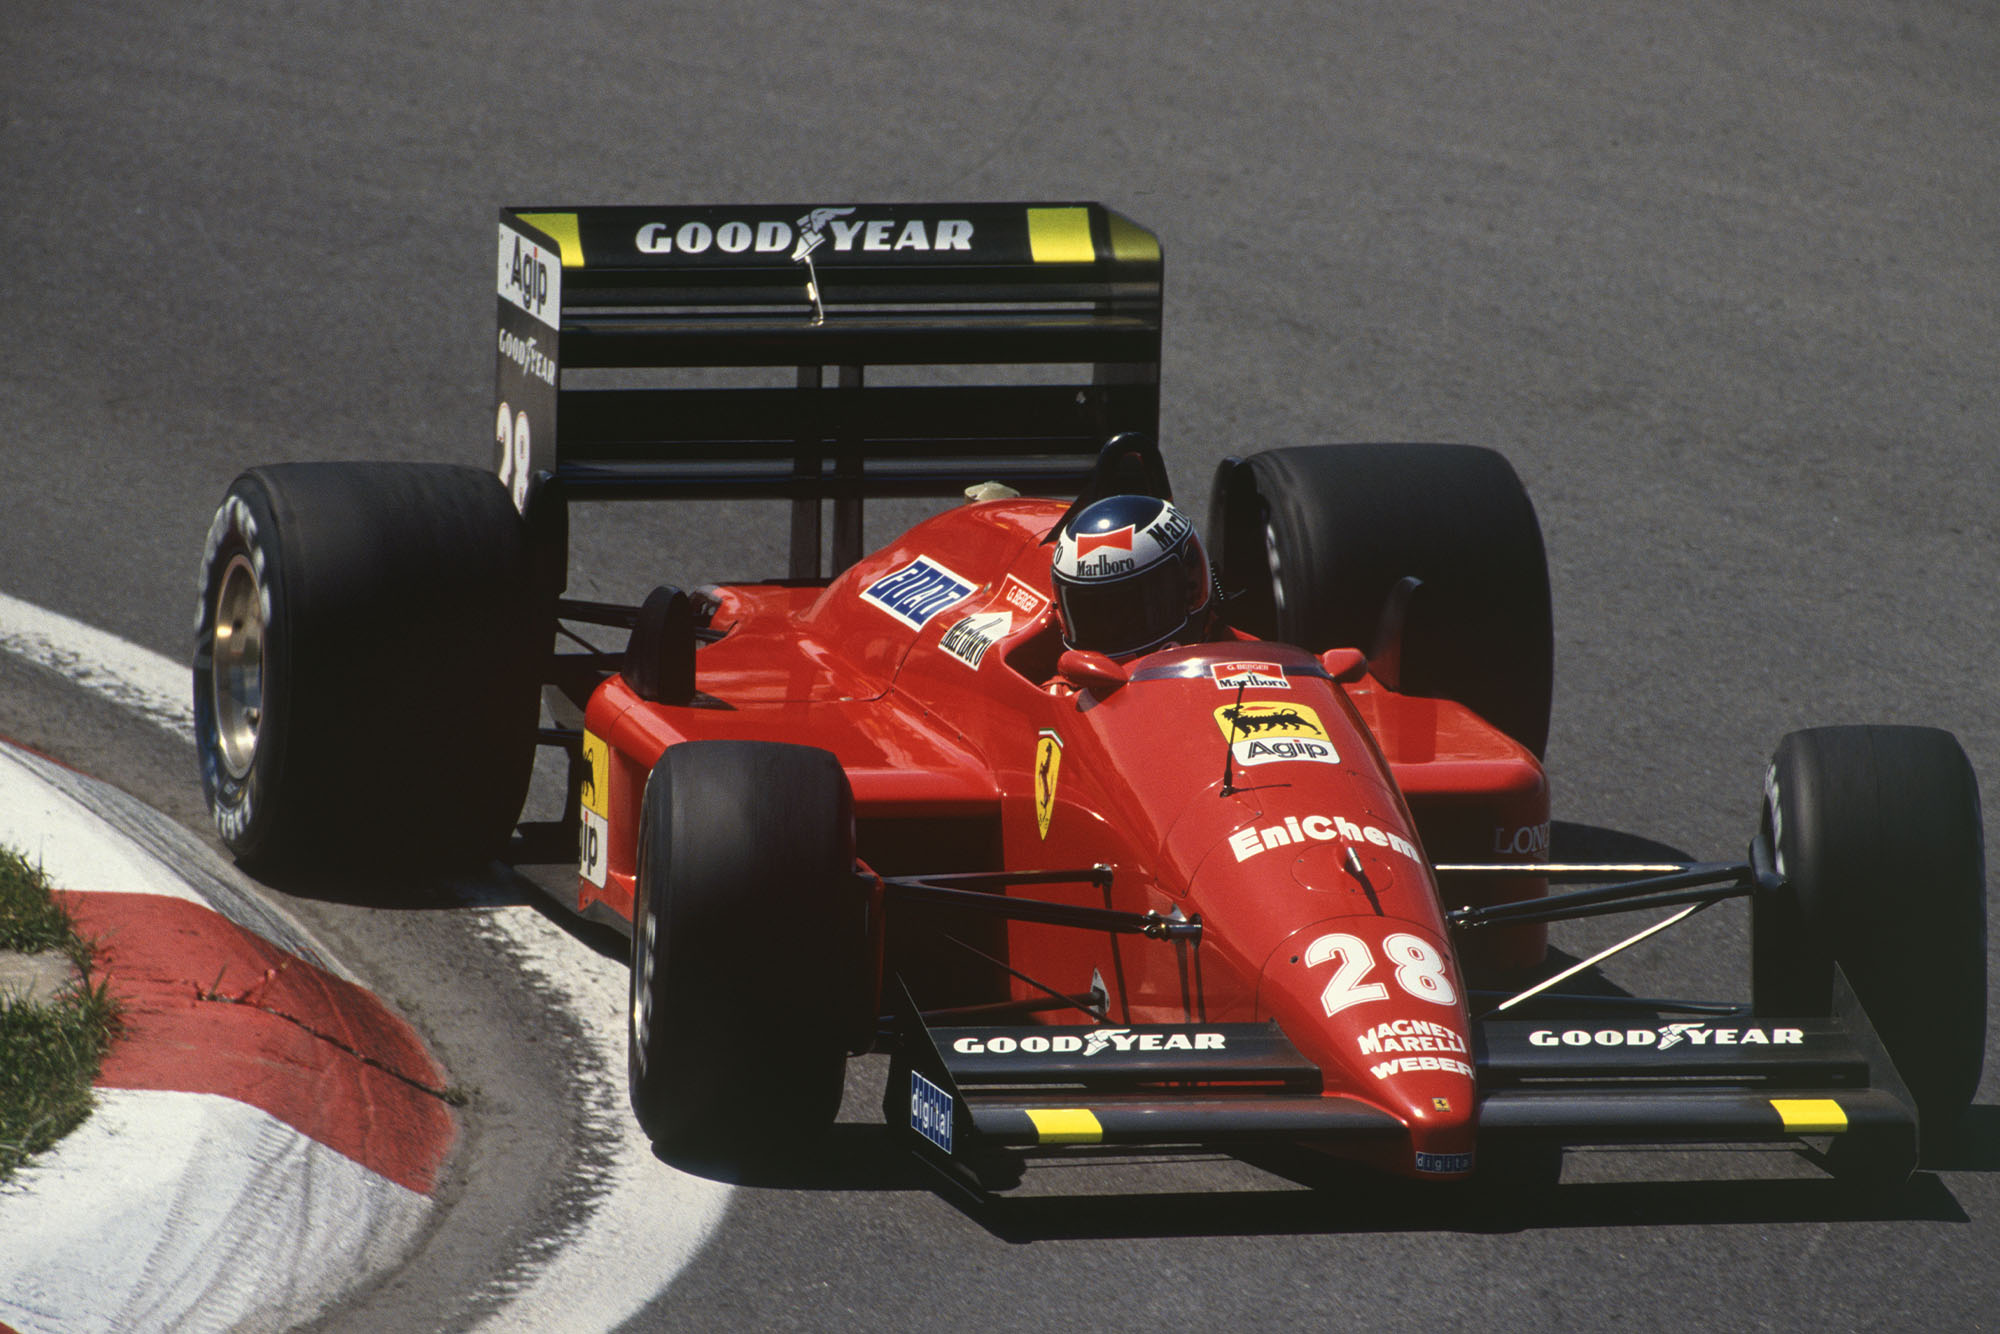 1988 CAN GP BergerQ3